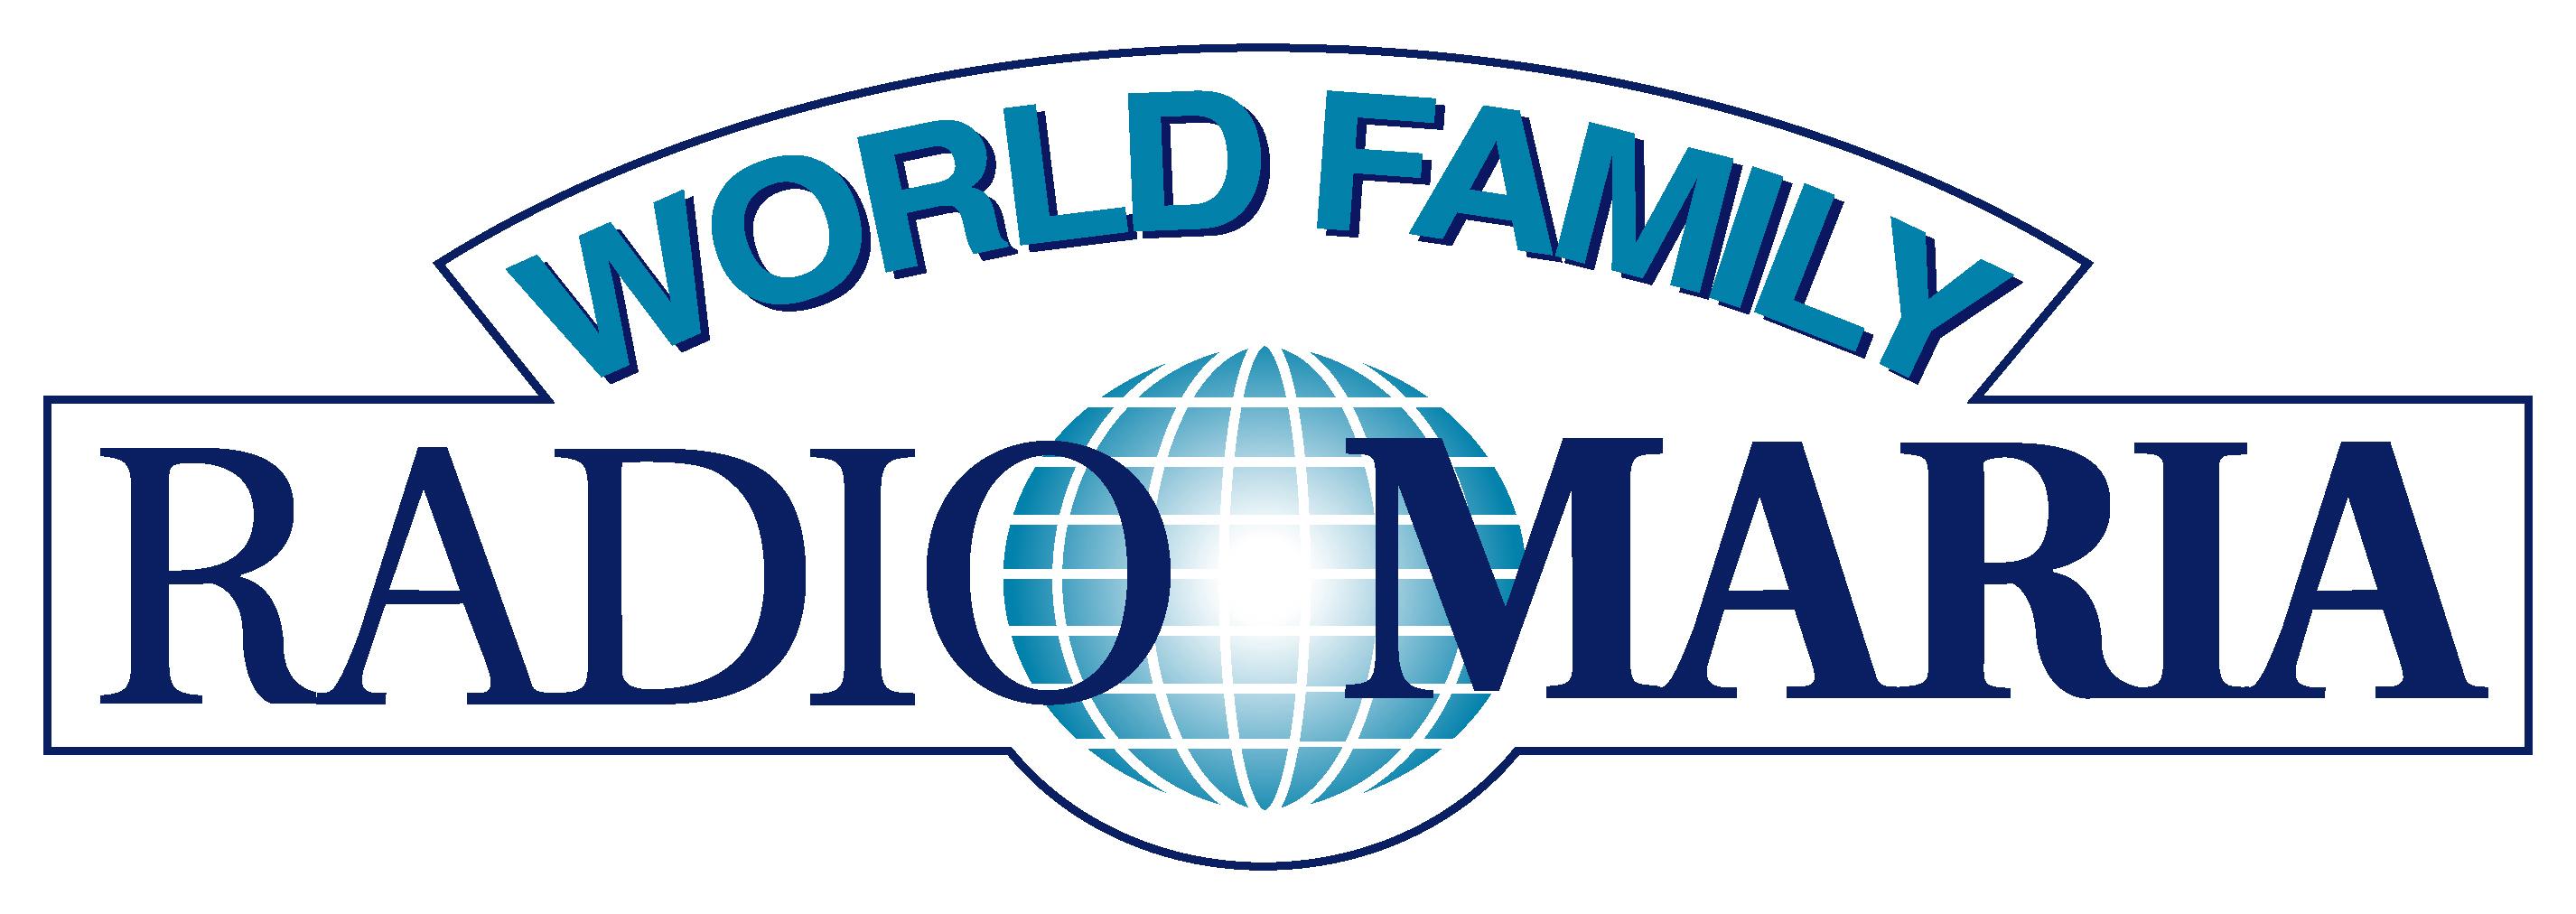 logo for World Family of Radio Maria